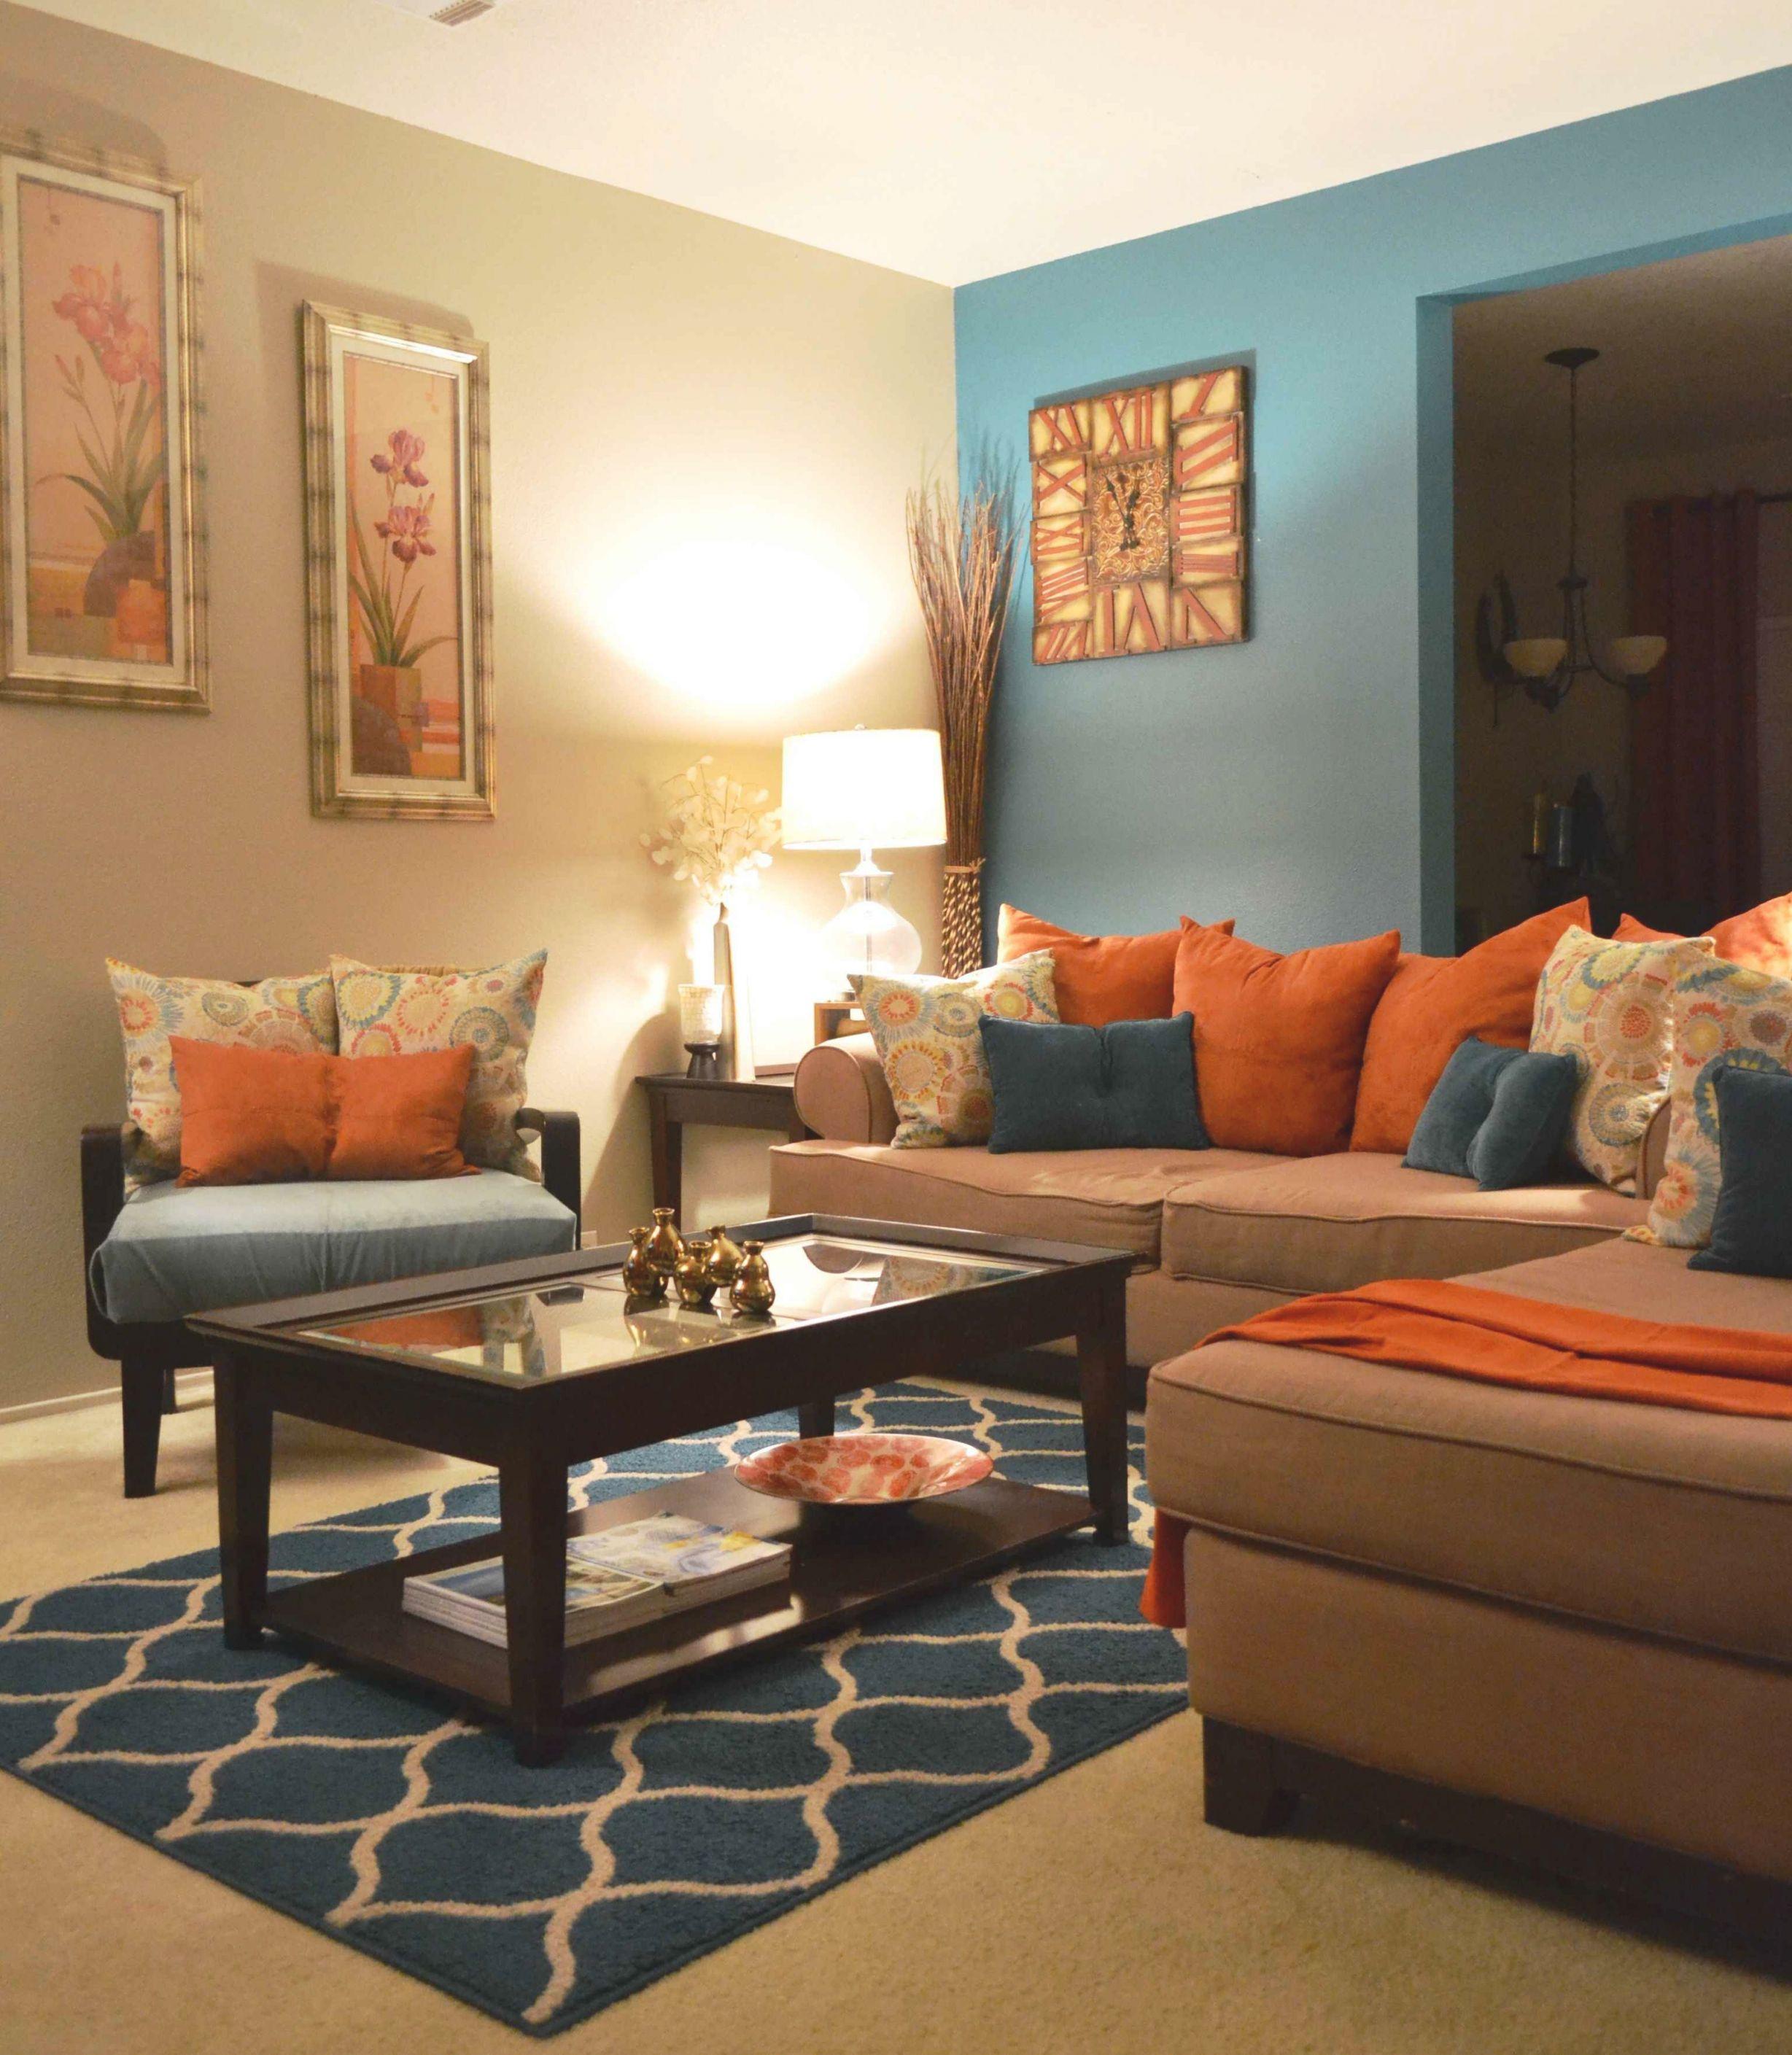 Living Room Teal Color Decor Brown Rooms Designs Dark Paint For Elegant Teal Living Room Furniture Awesome Decors